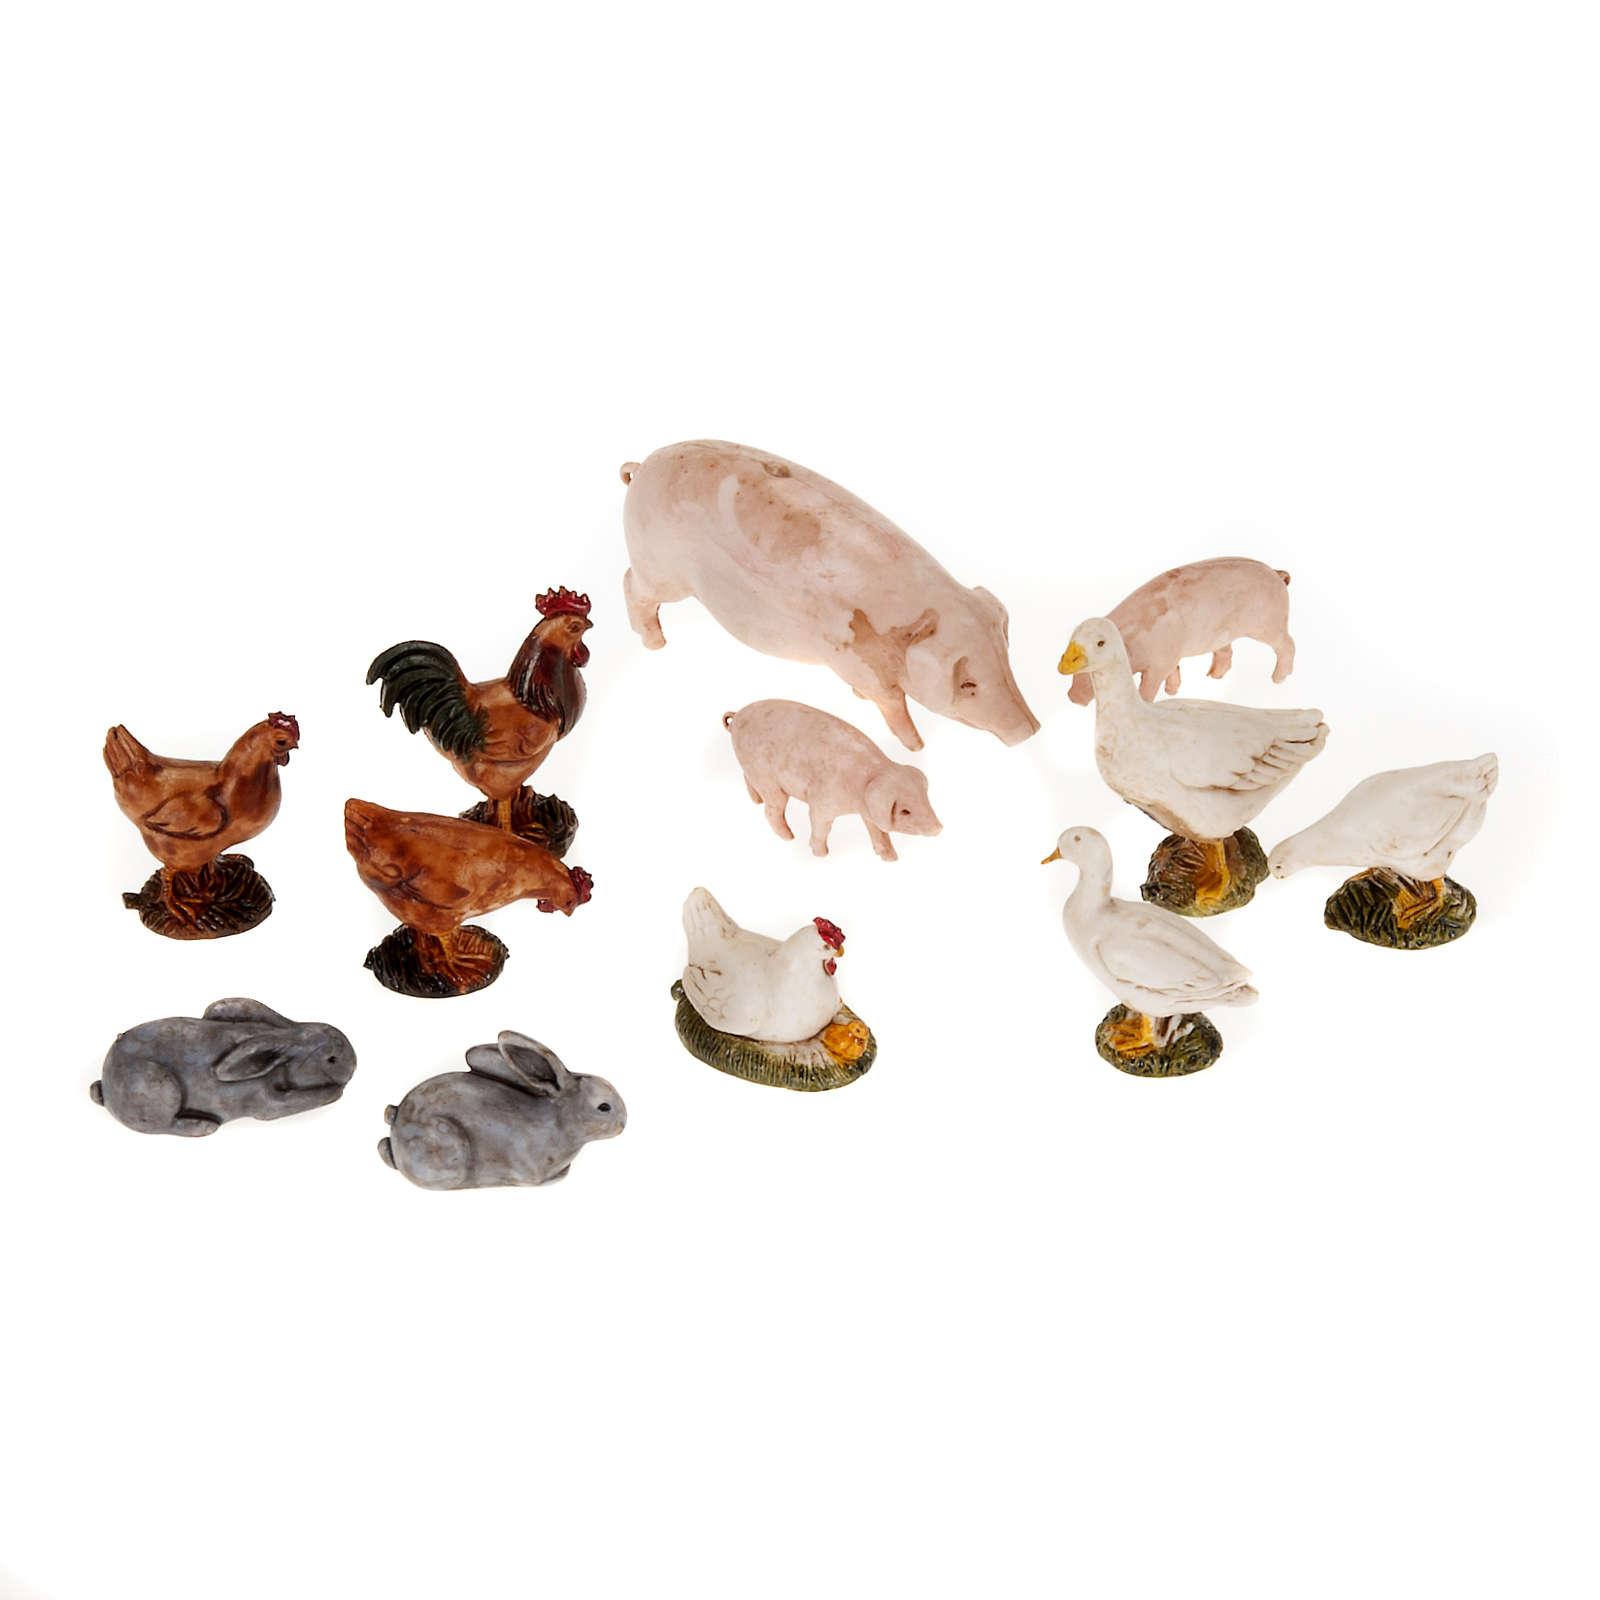 Nativity scene figurines, farm yard animals 12pcs 3